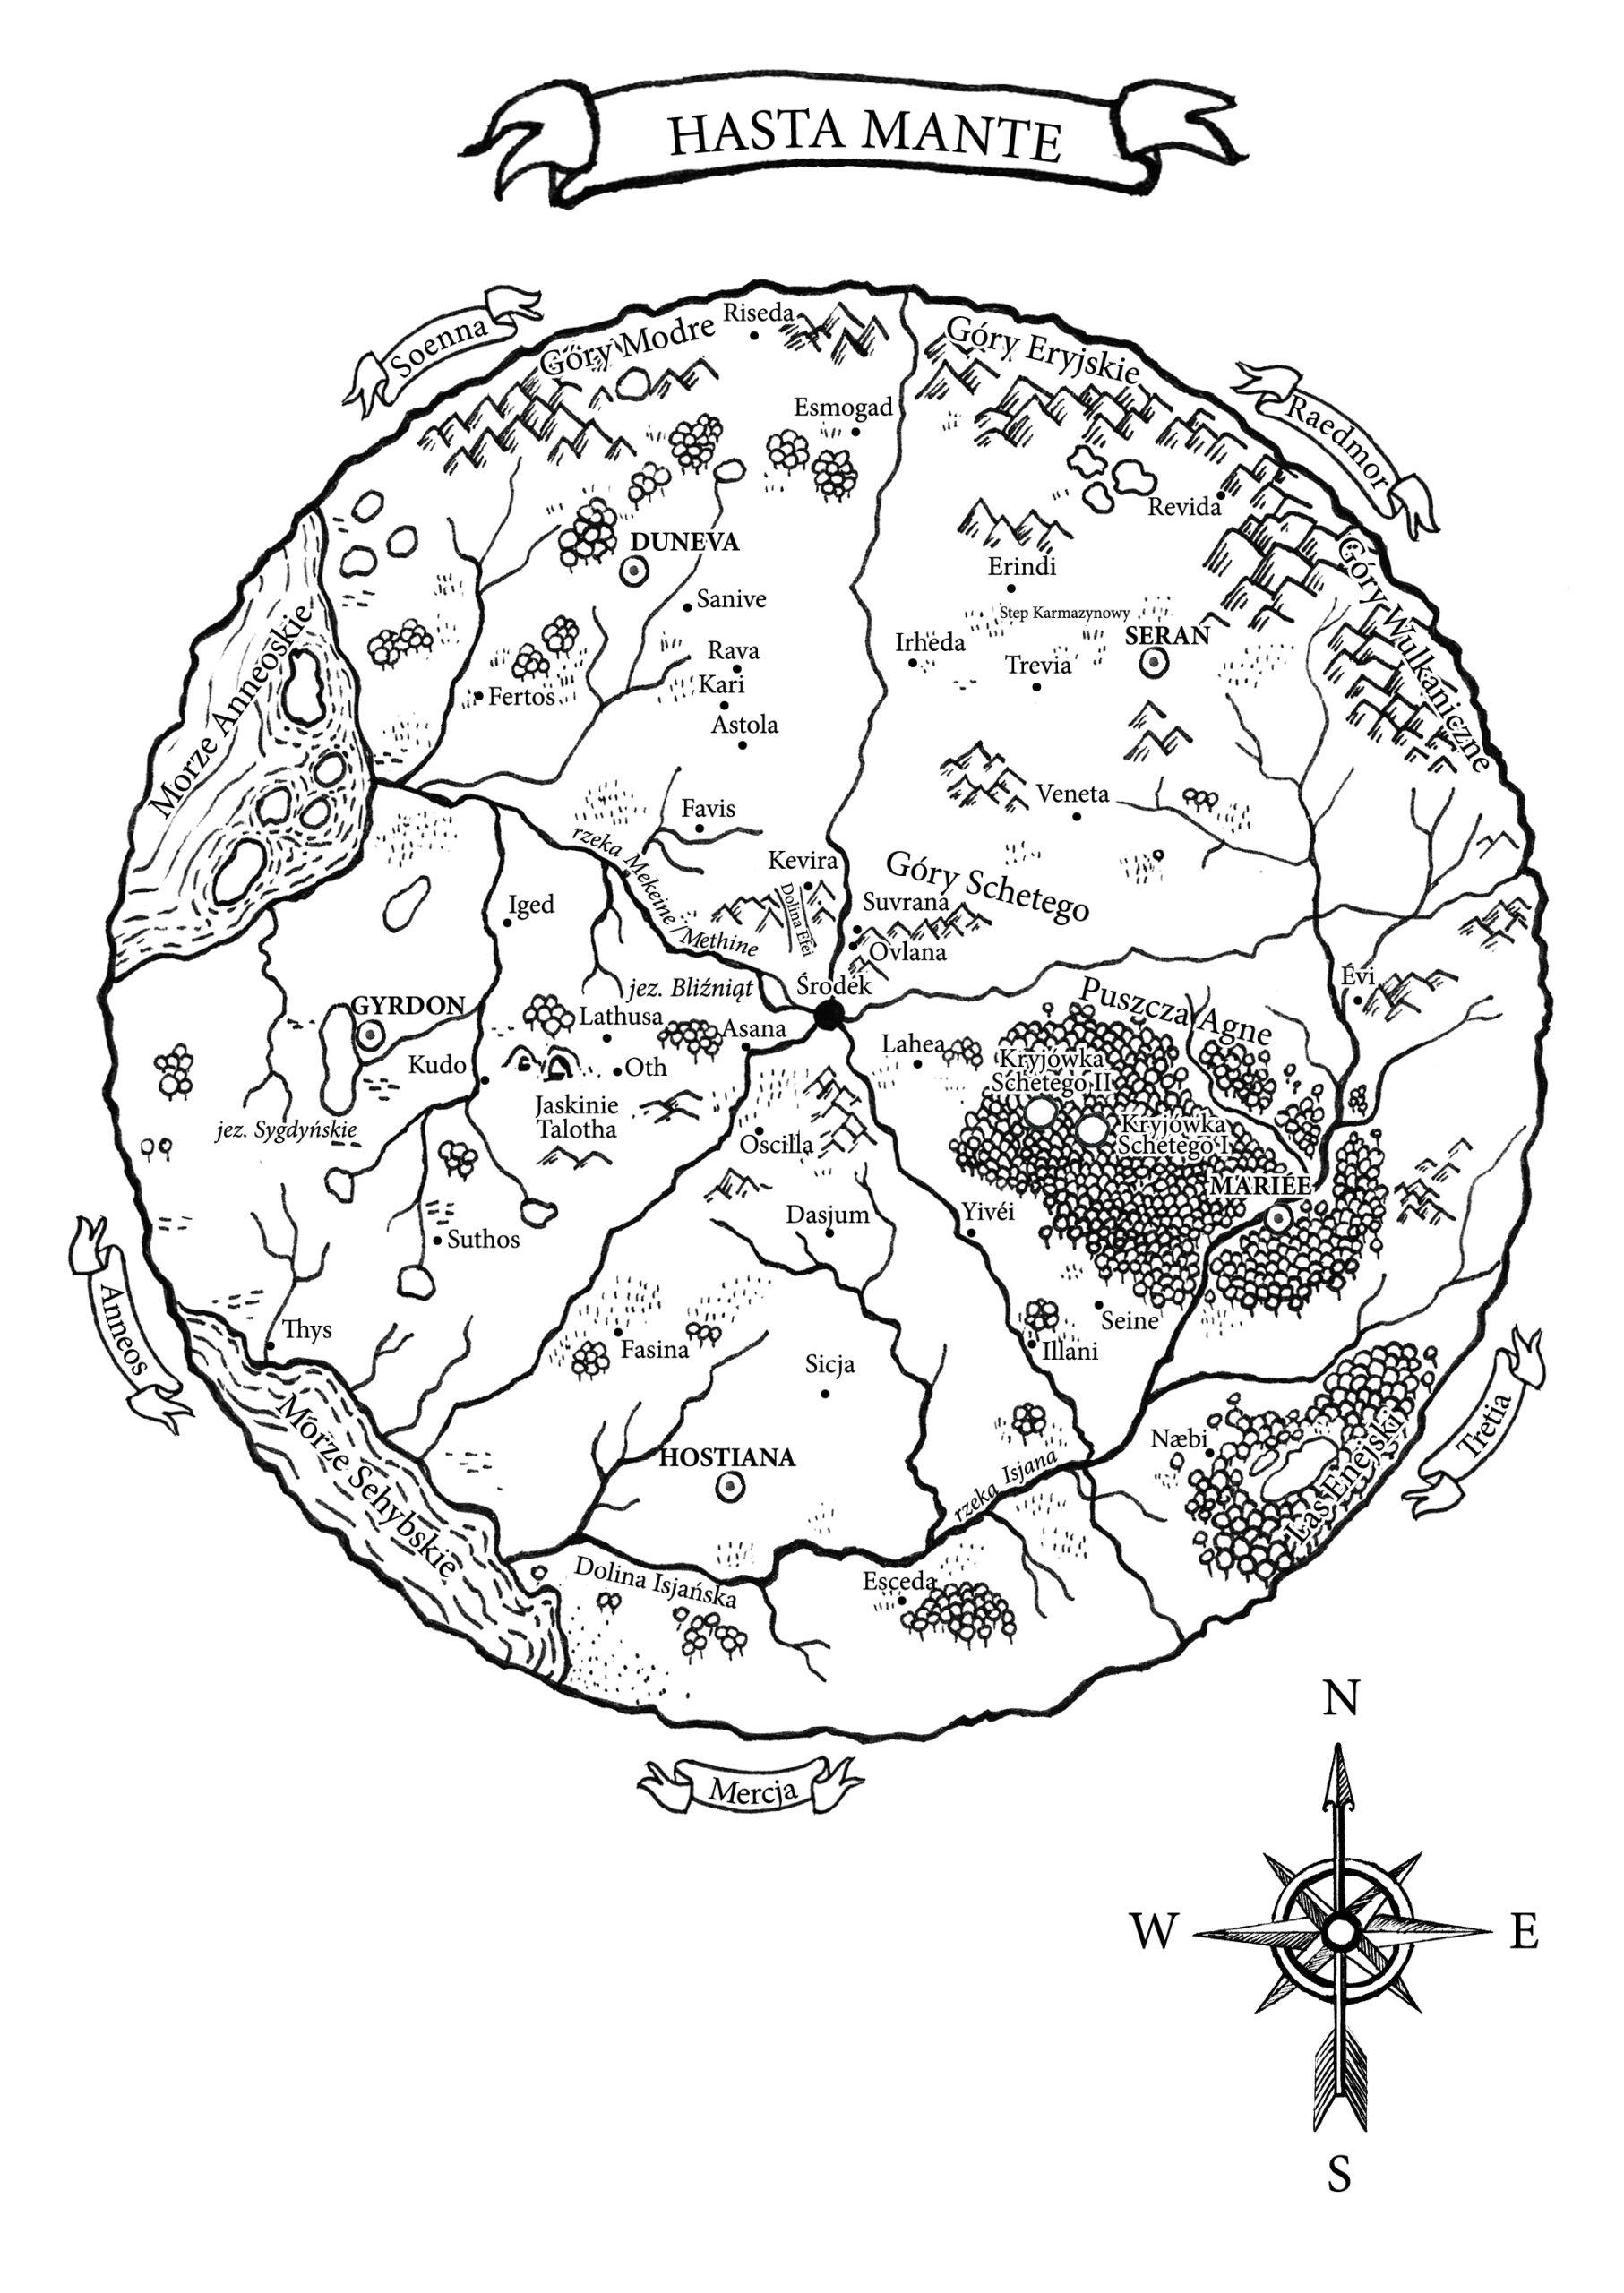 Mapa Hasta Mante